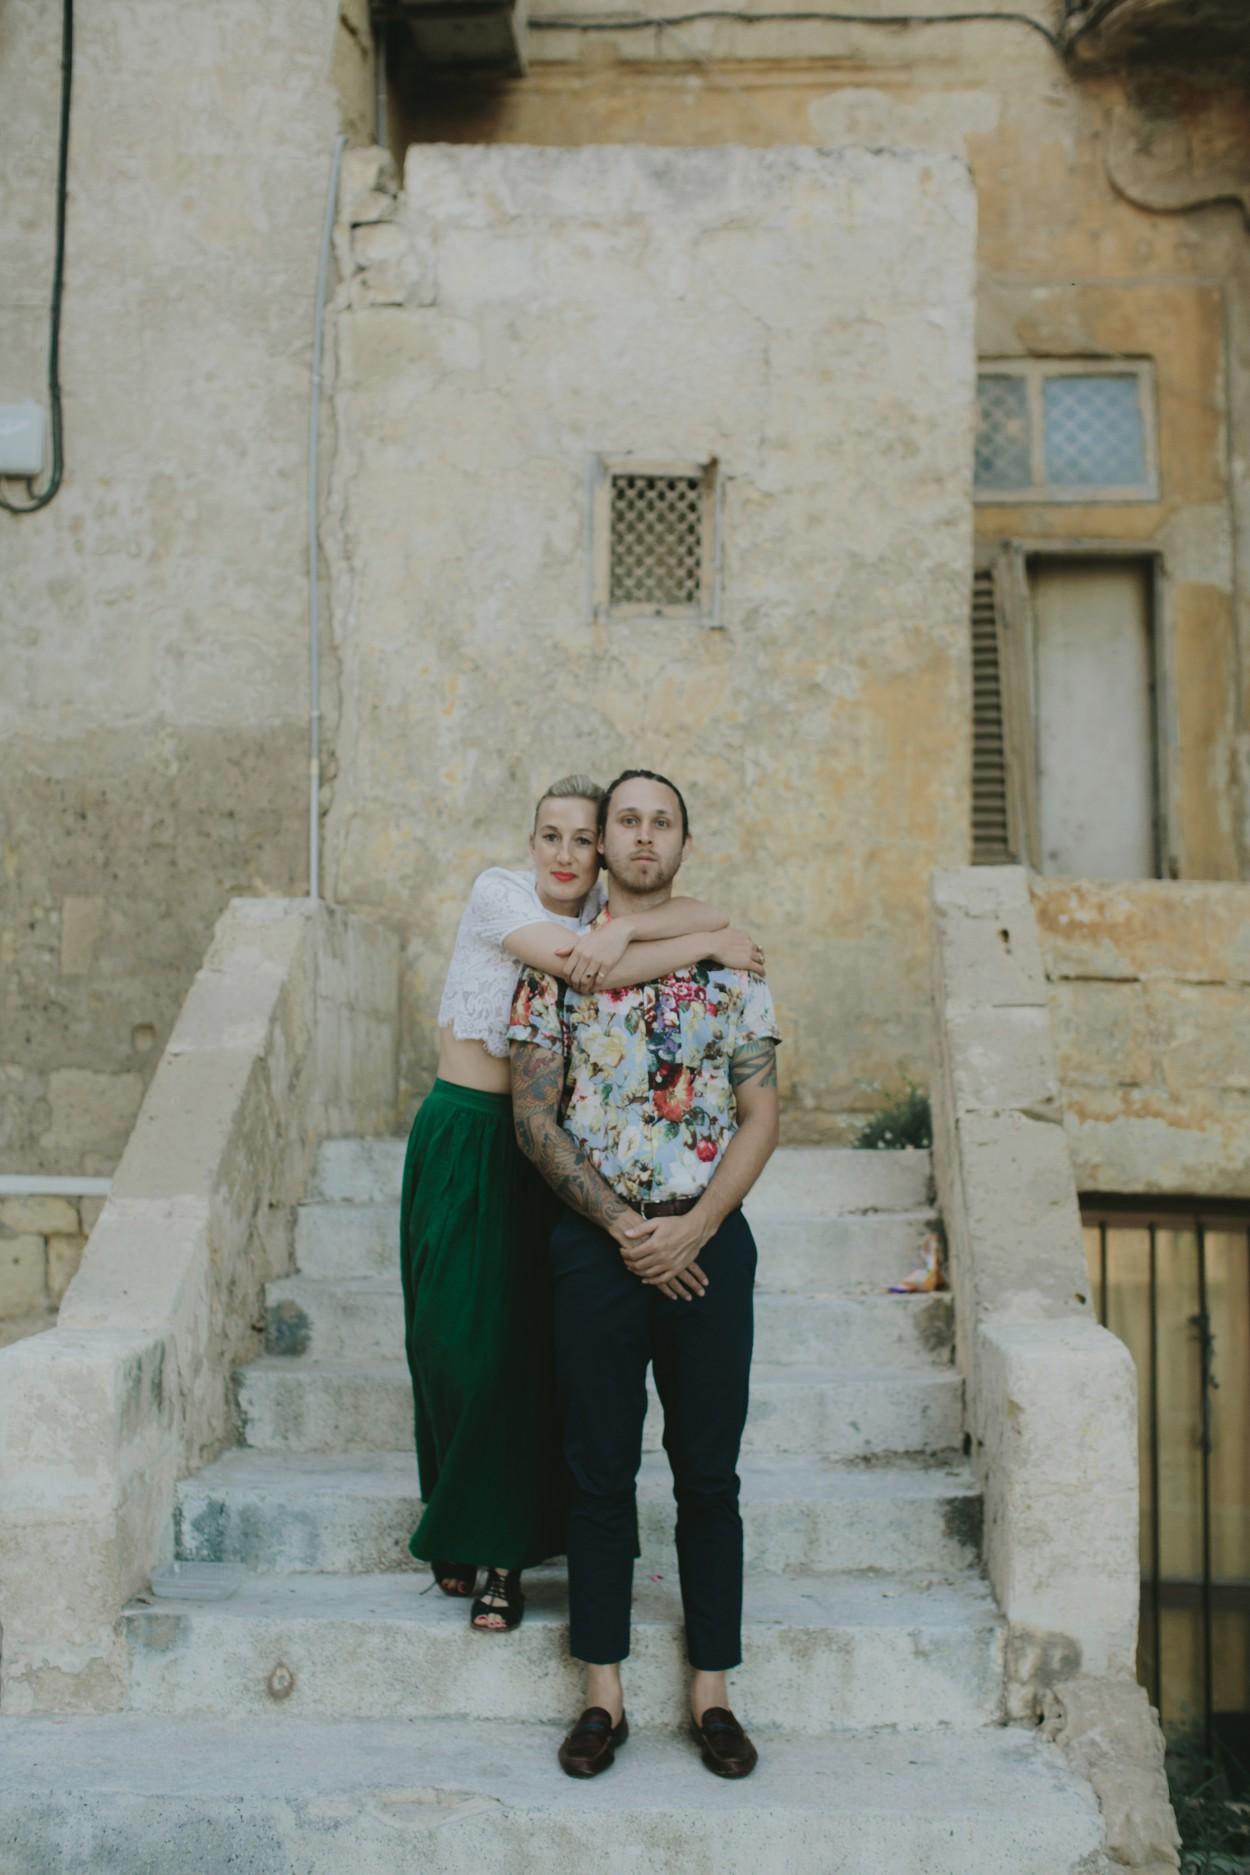 I-Got-You-Babe-Weddings-Malta-Destination-Elopement-Petra-Brent009.jpg